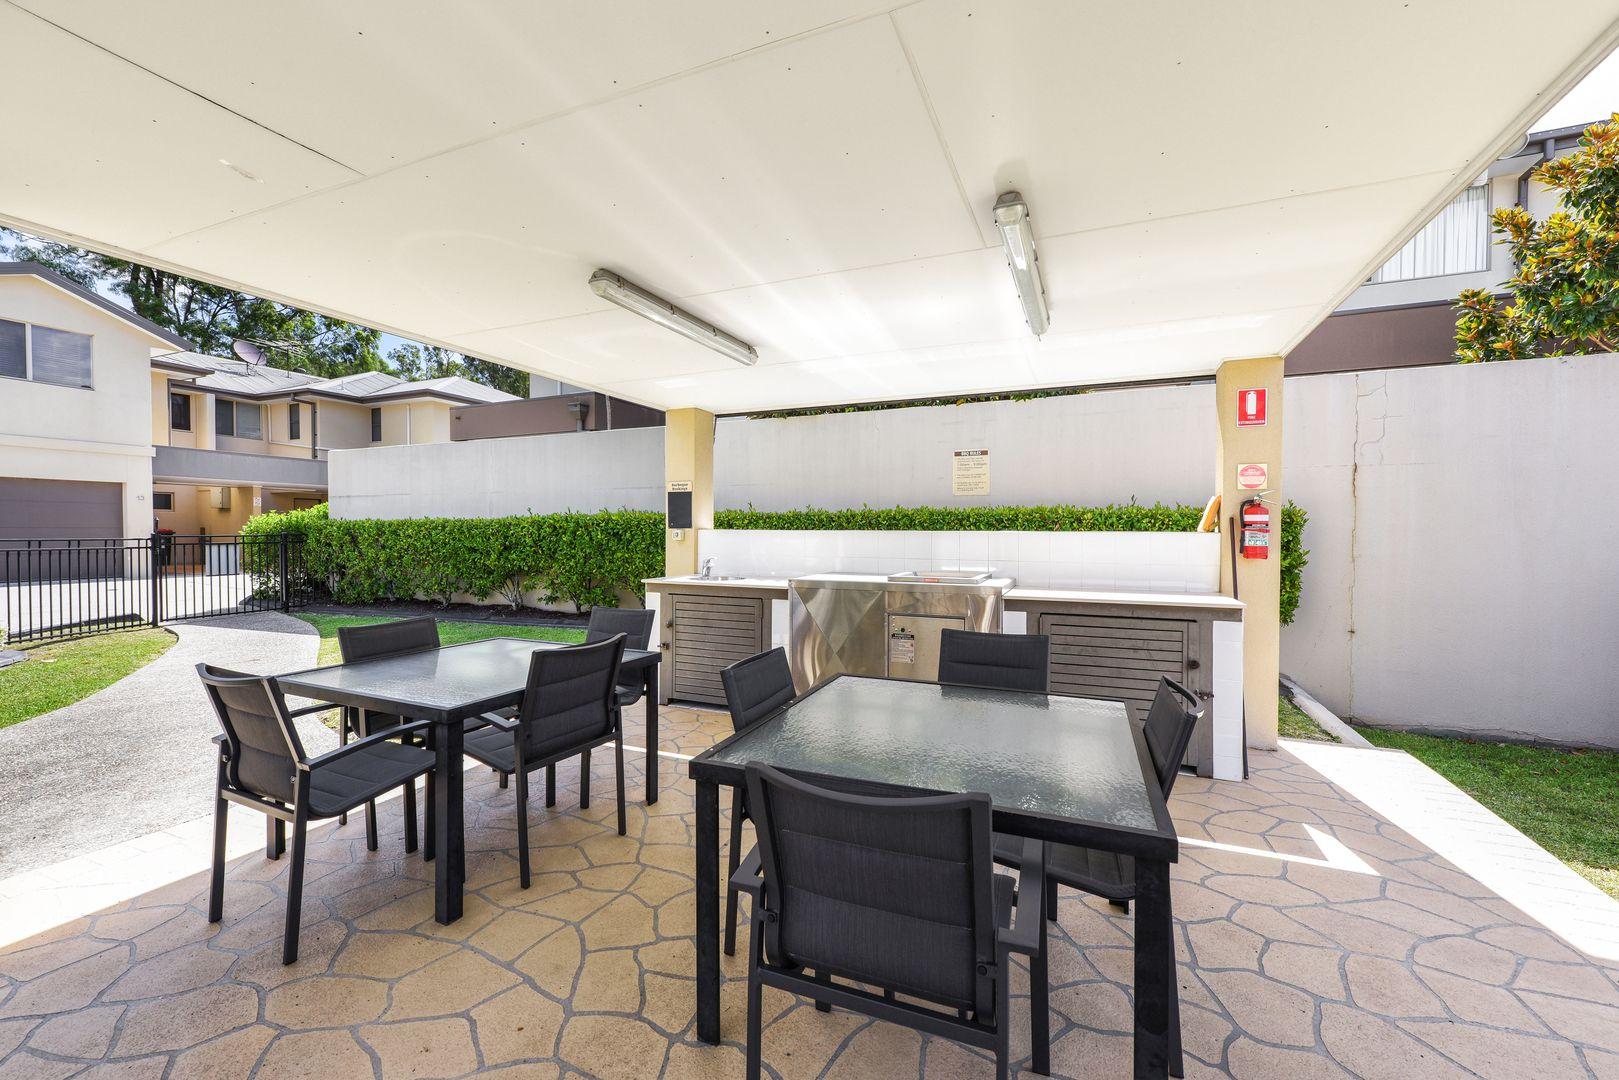 12/158 Woogaroo Street, Forest Lake QLD 4078, Image 1